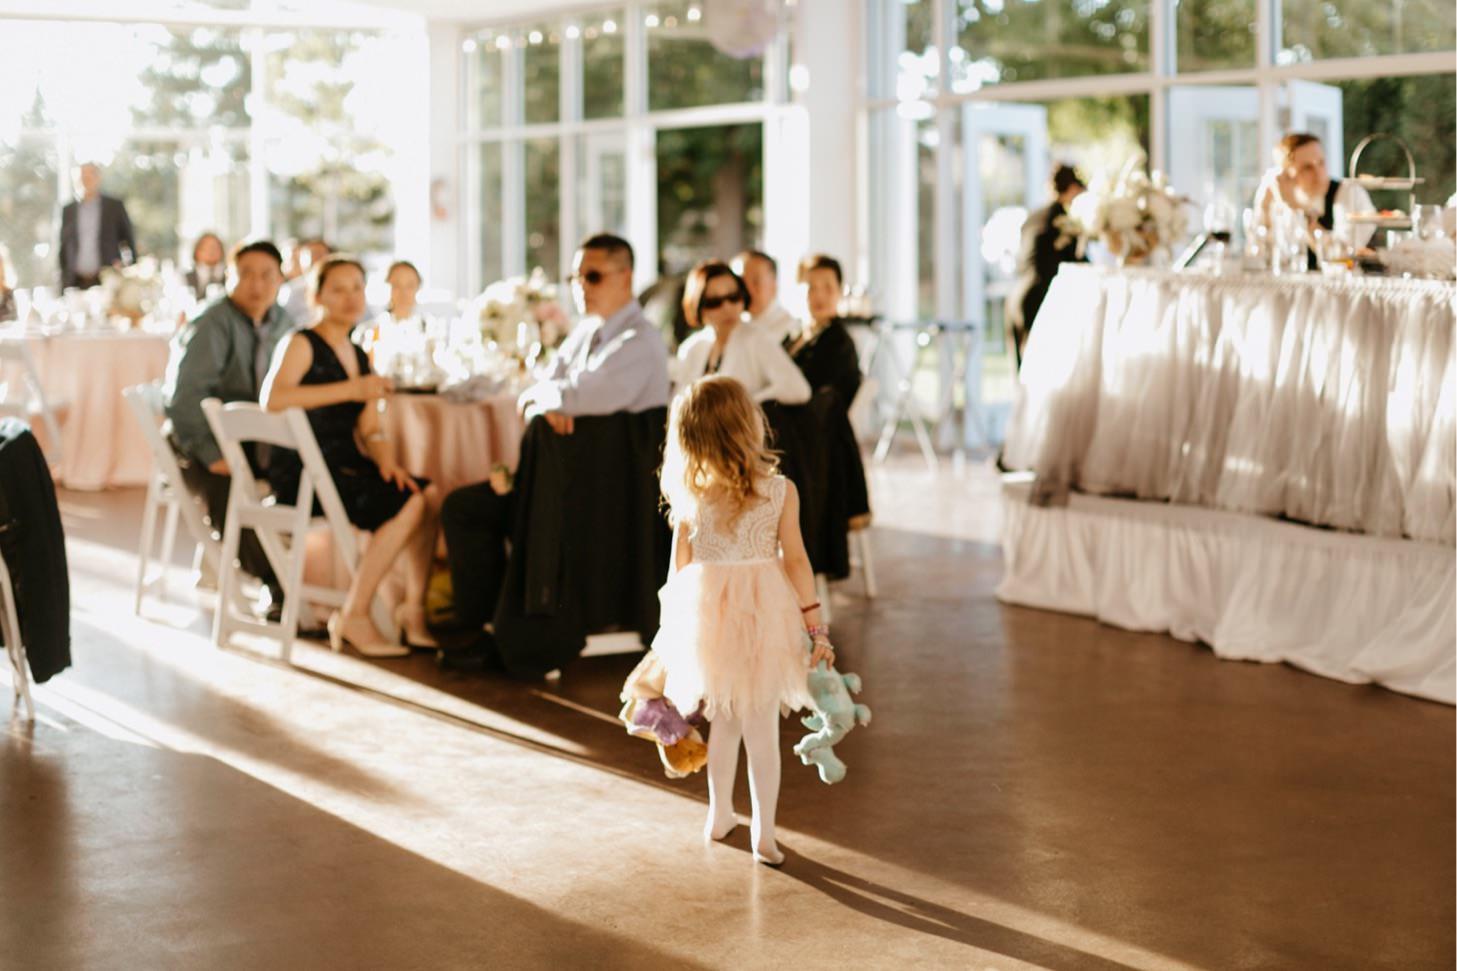 ritz-charles-wedding-reception-downtown-indianapolis-wedding-photographer037.JPG